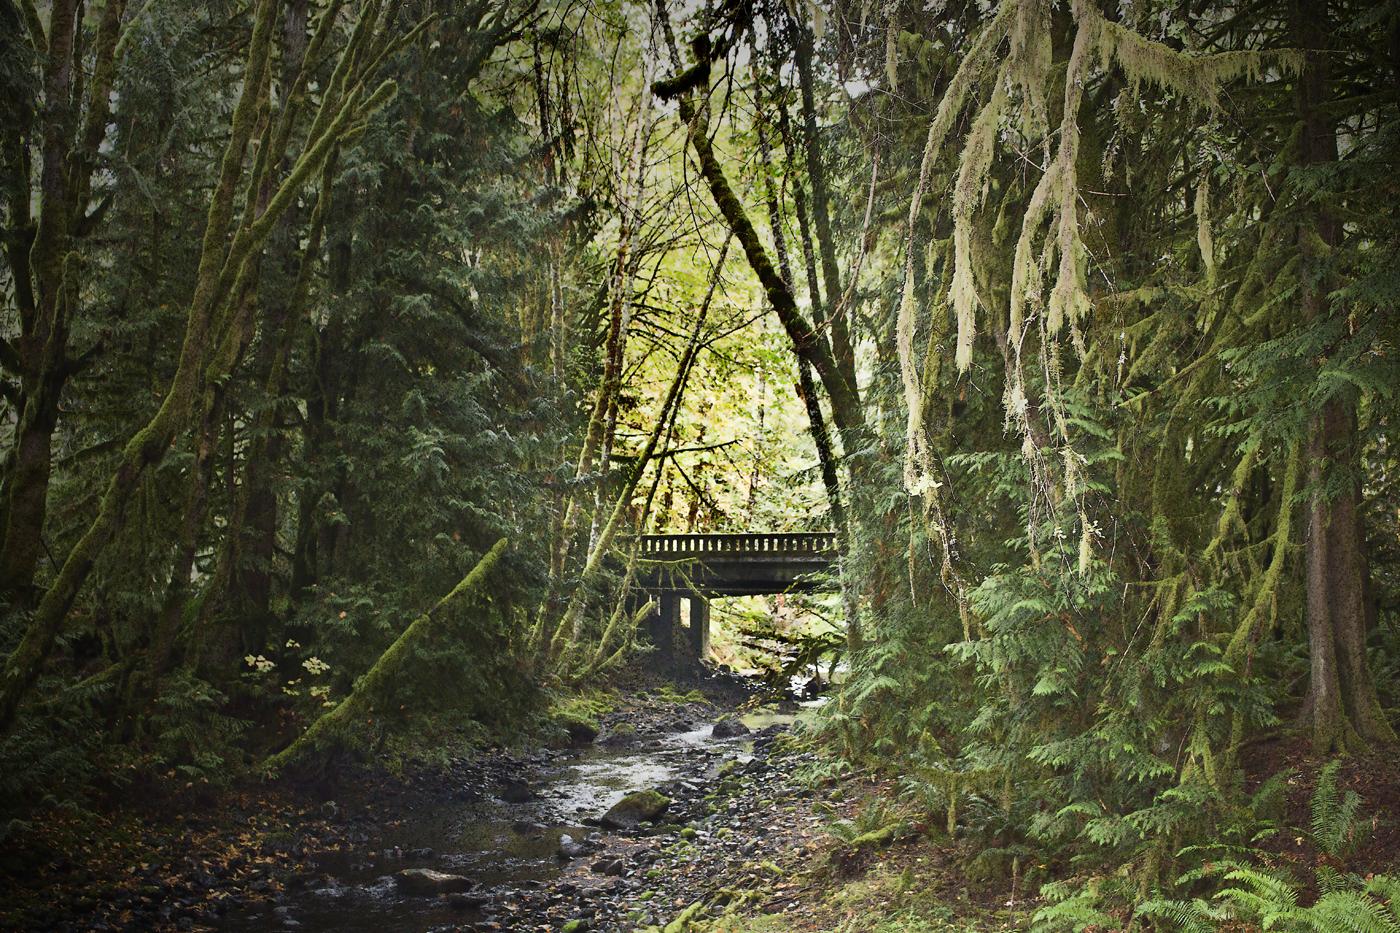 Bridge Across A Creek